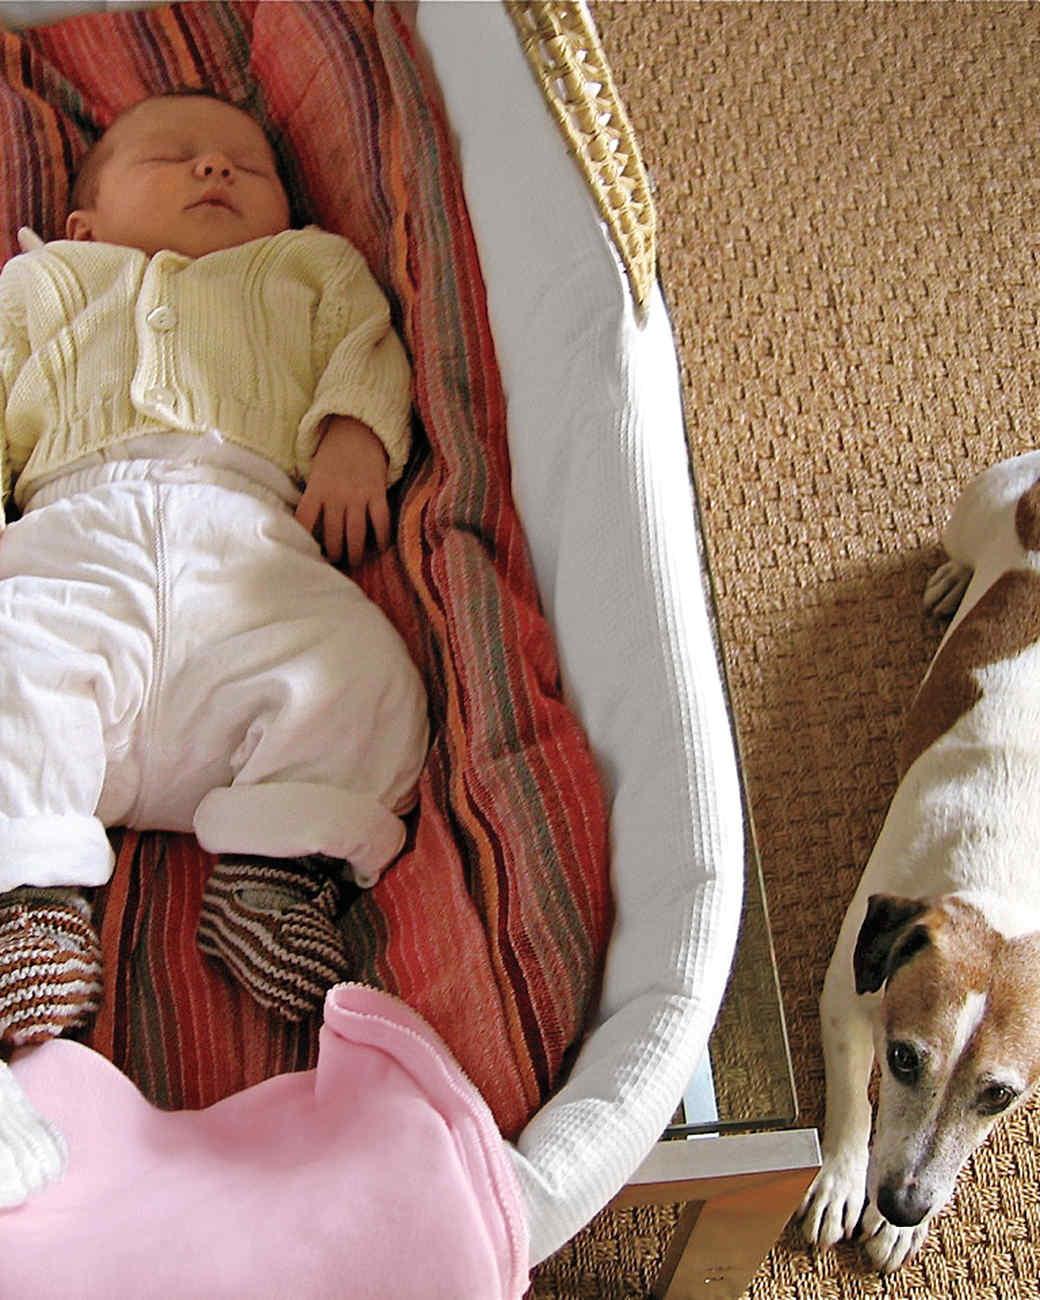 sleeping-baby-dog-0146.jpg